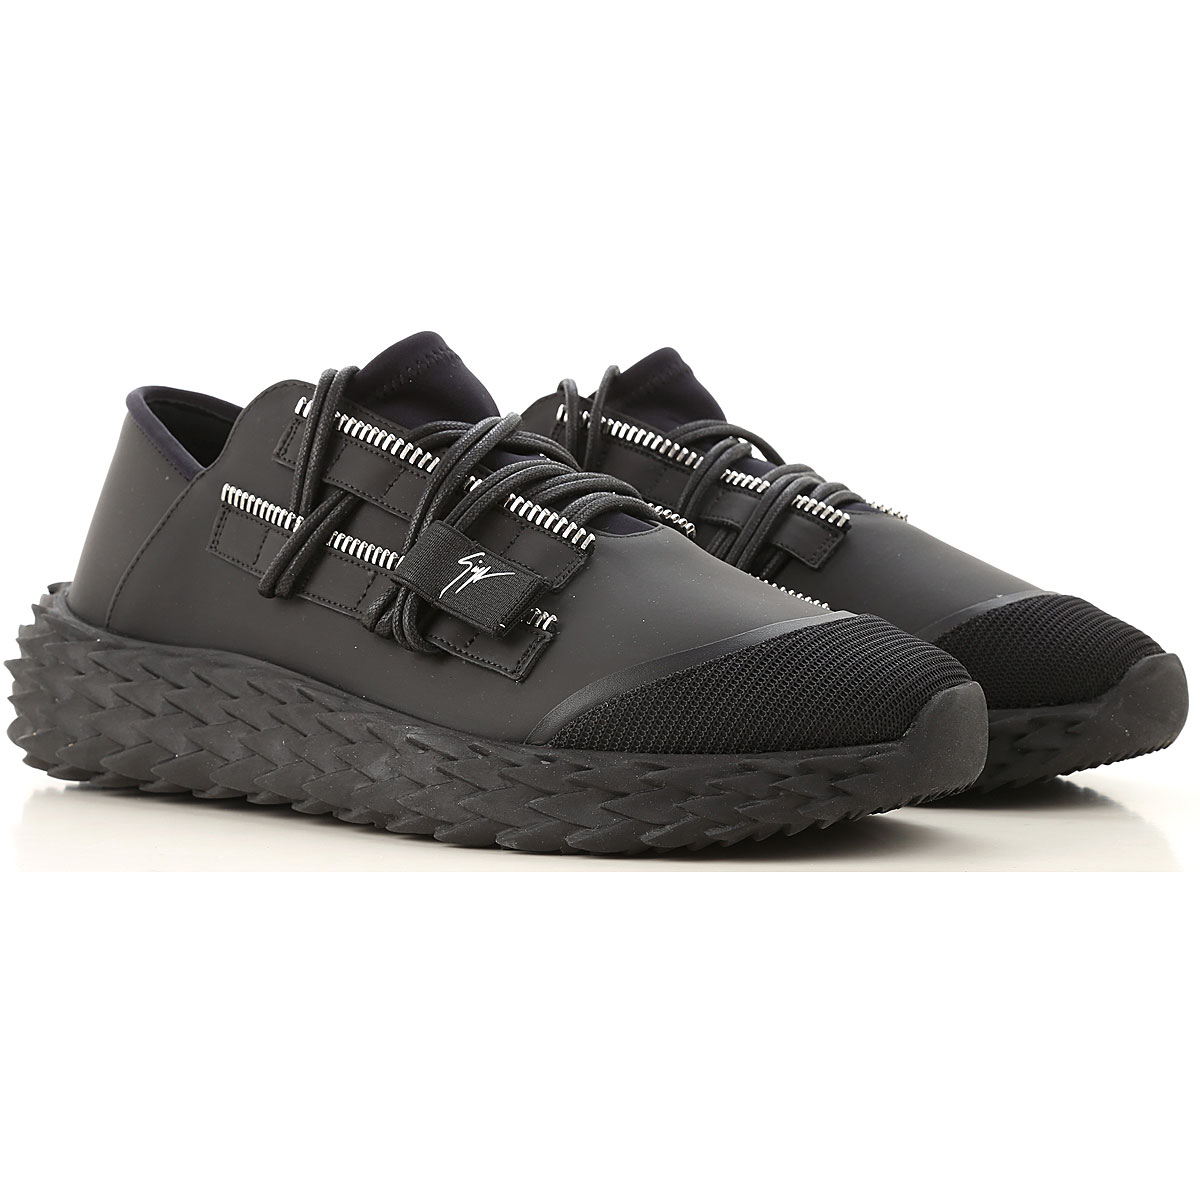 Giuseppe Zanotti Design Sneakers for Men On Sale, Black, Leather, 2019, 10 10.5 8 8.5 9 9.5